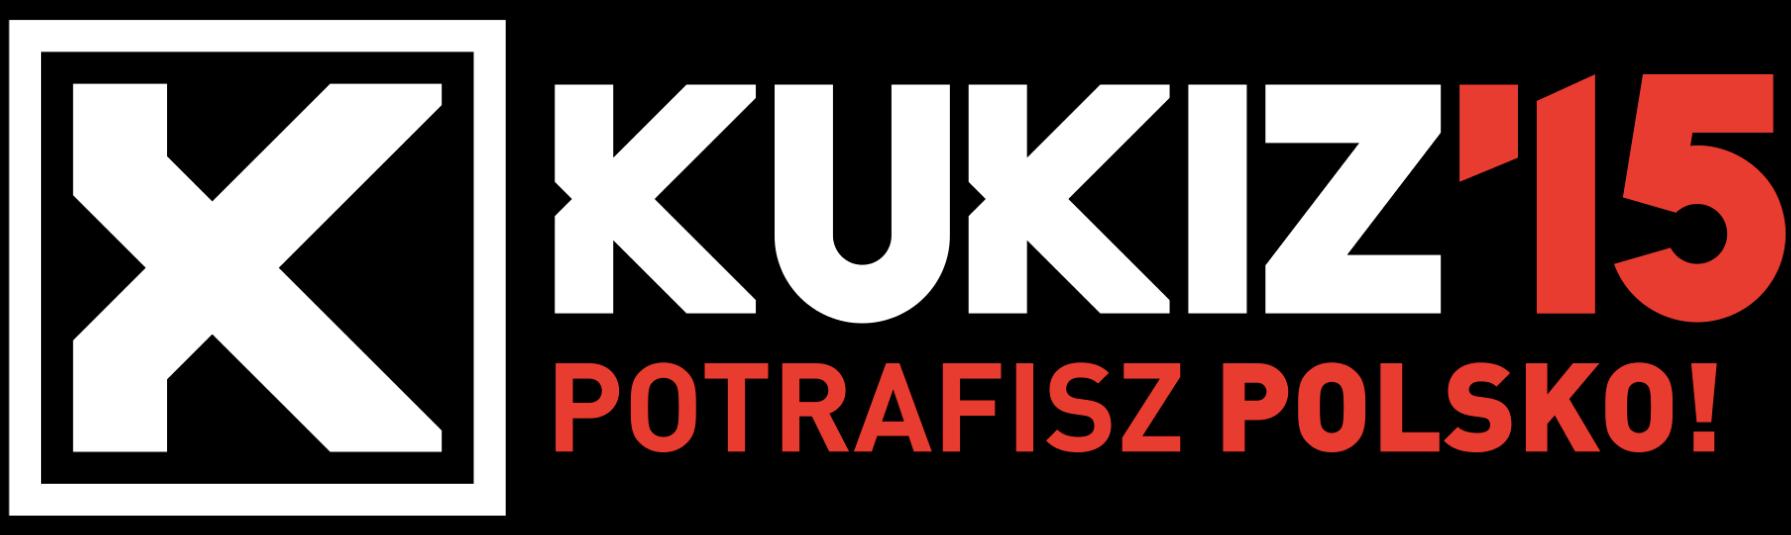 di maio Pawel Kukiz Kukiz'15 europee fascisti - 3